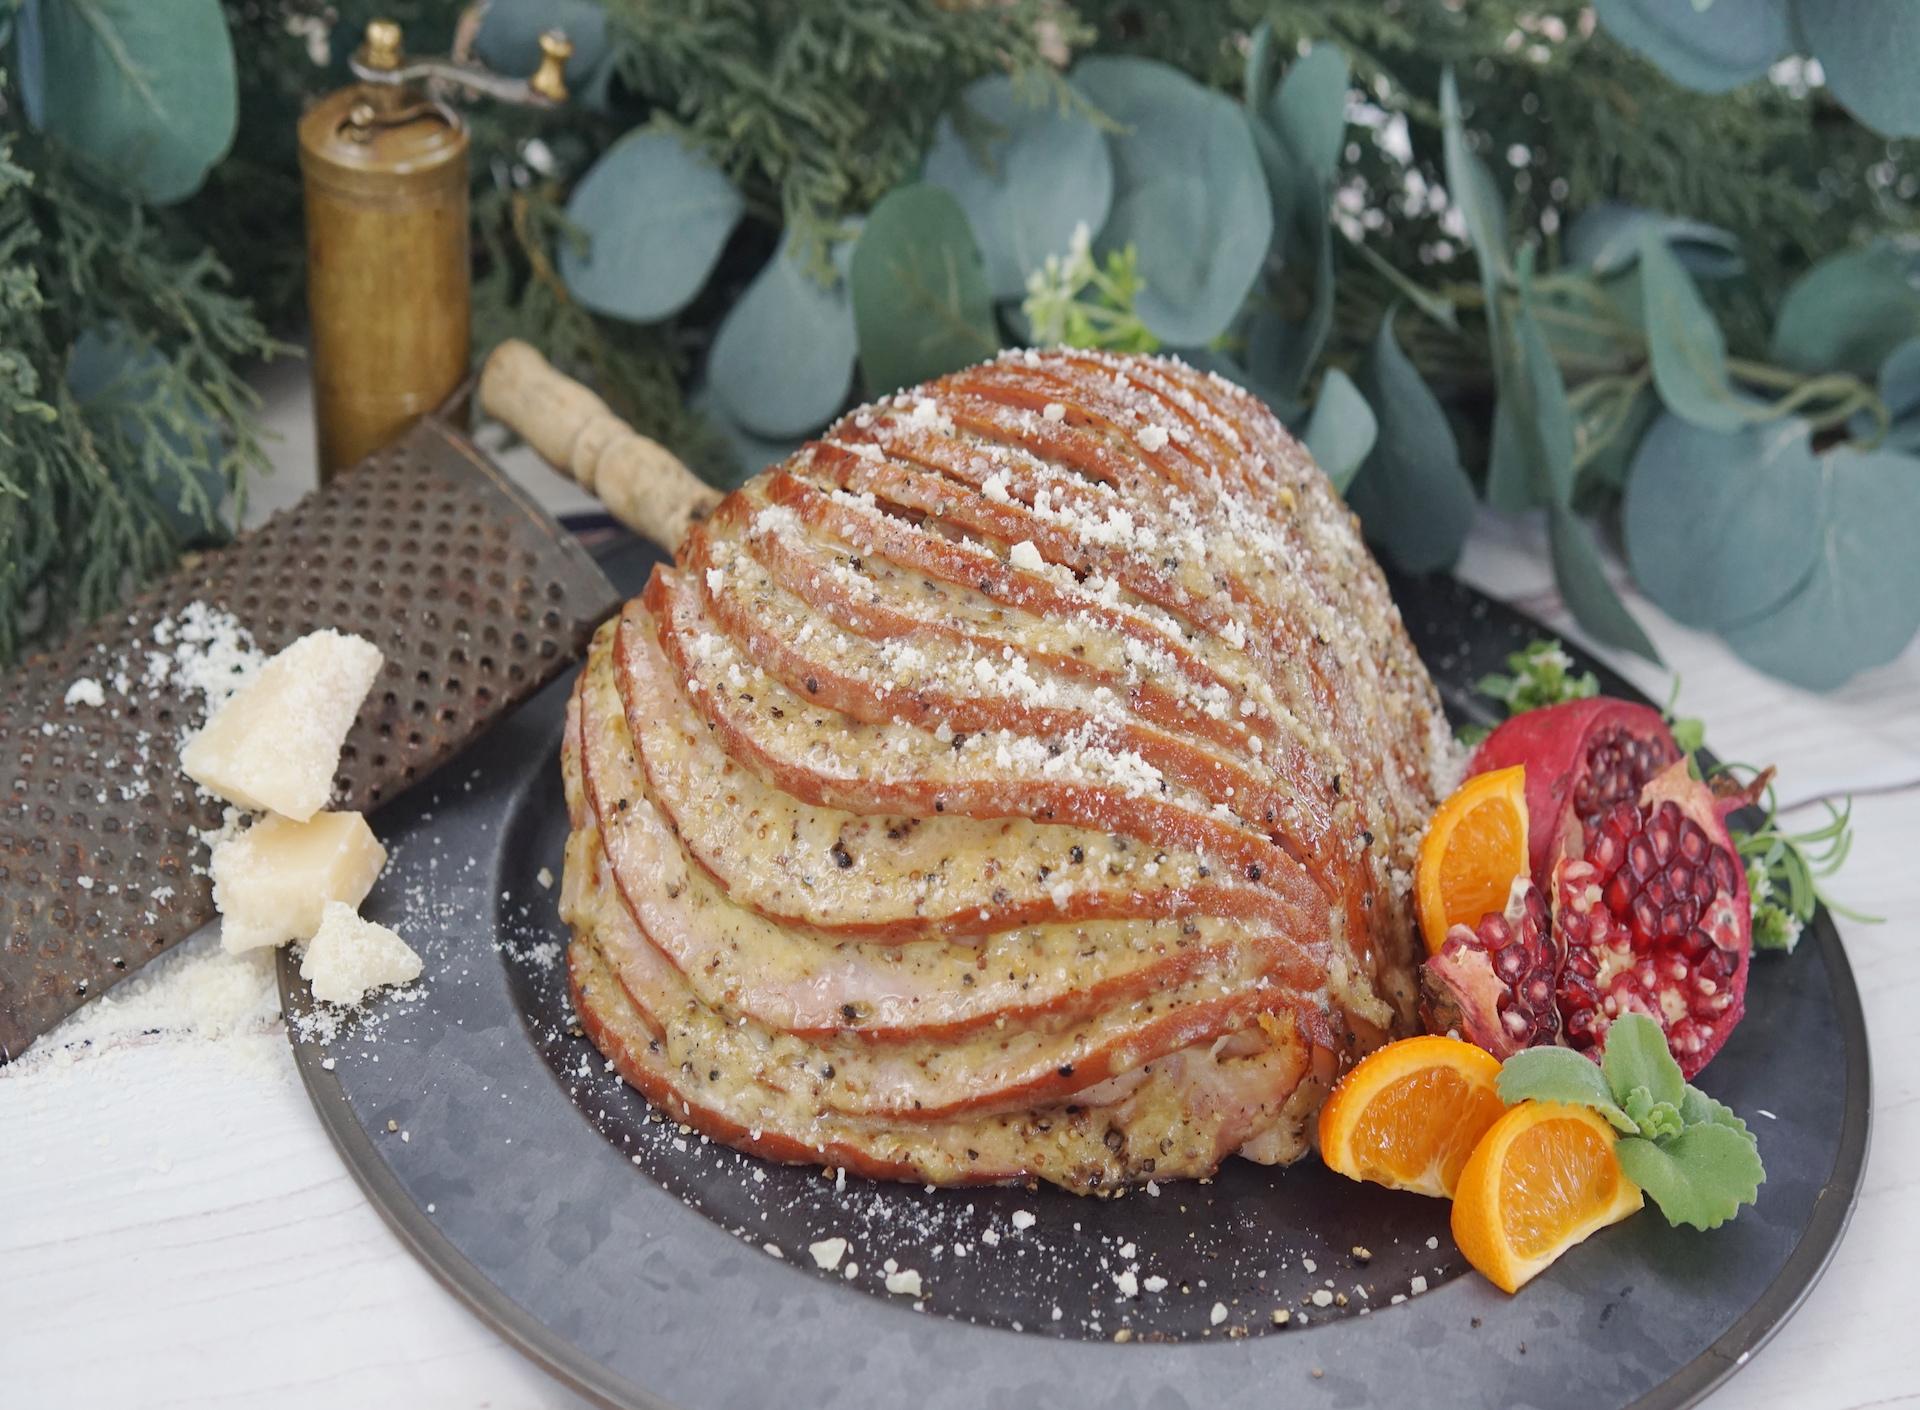 Parmesan Black Peppercorn Encrusted Ham